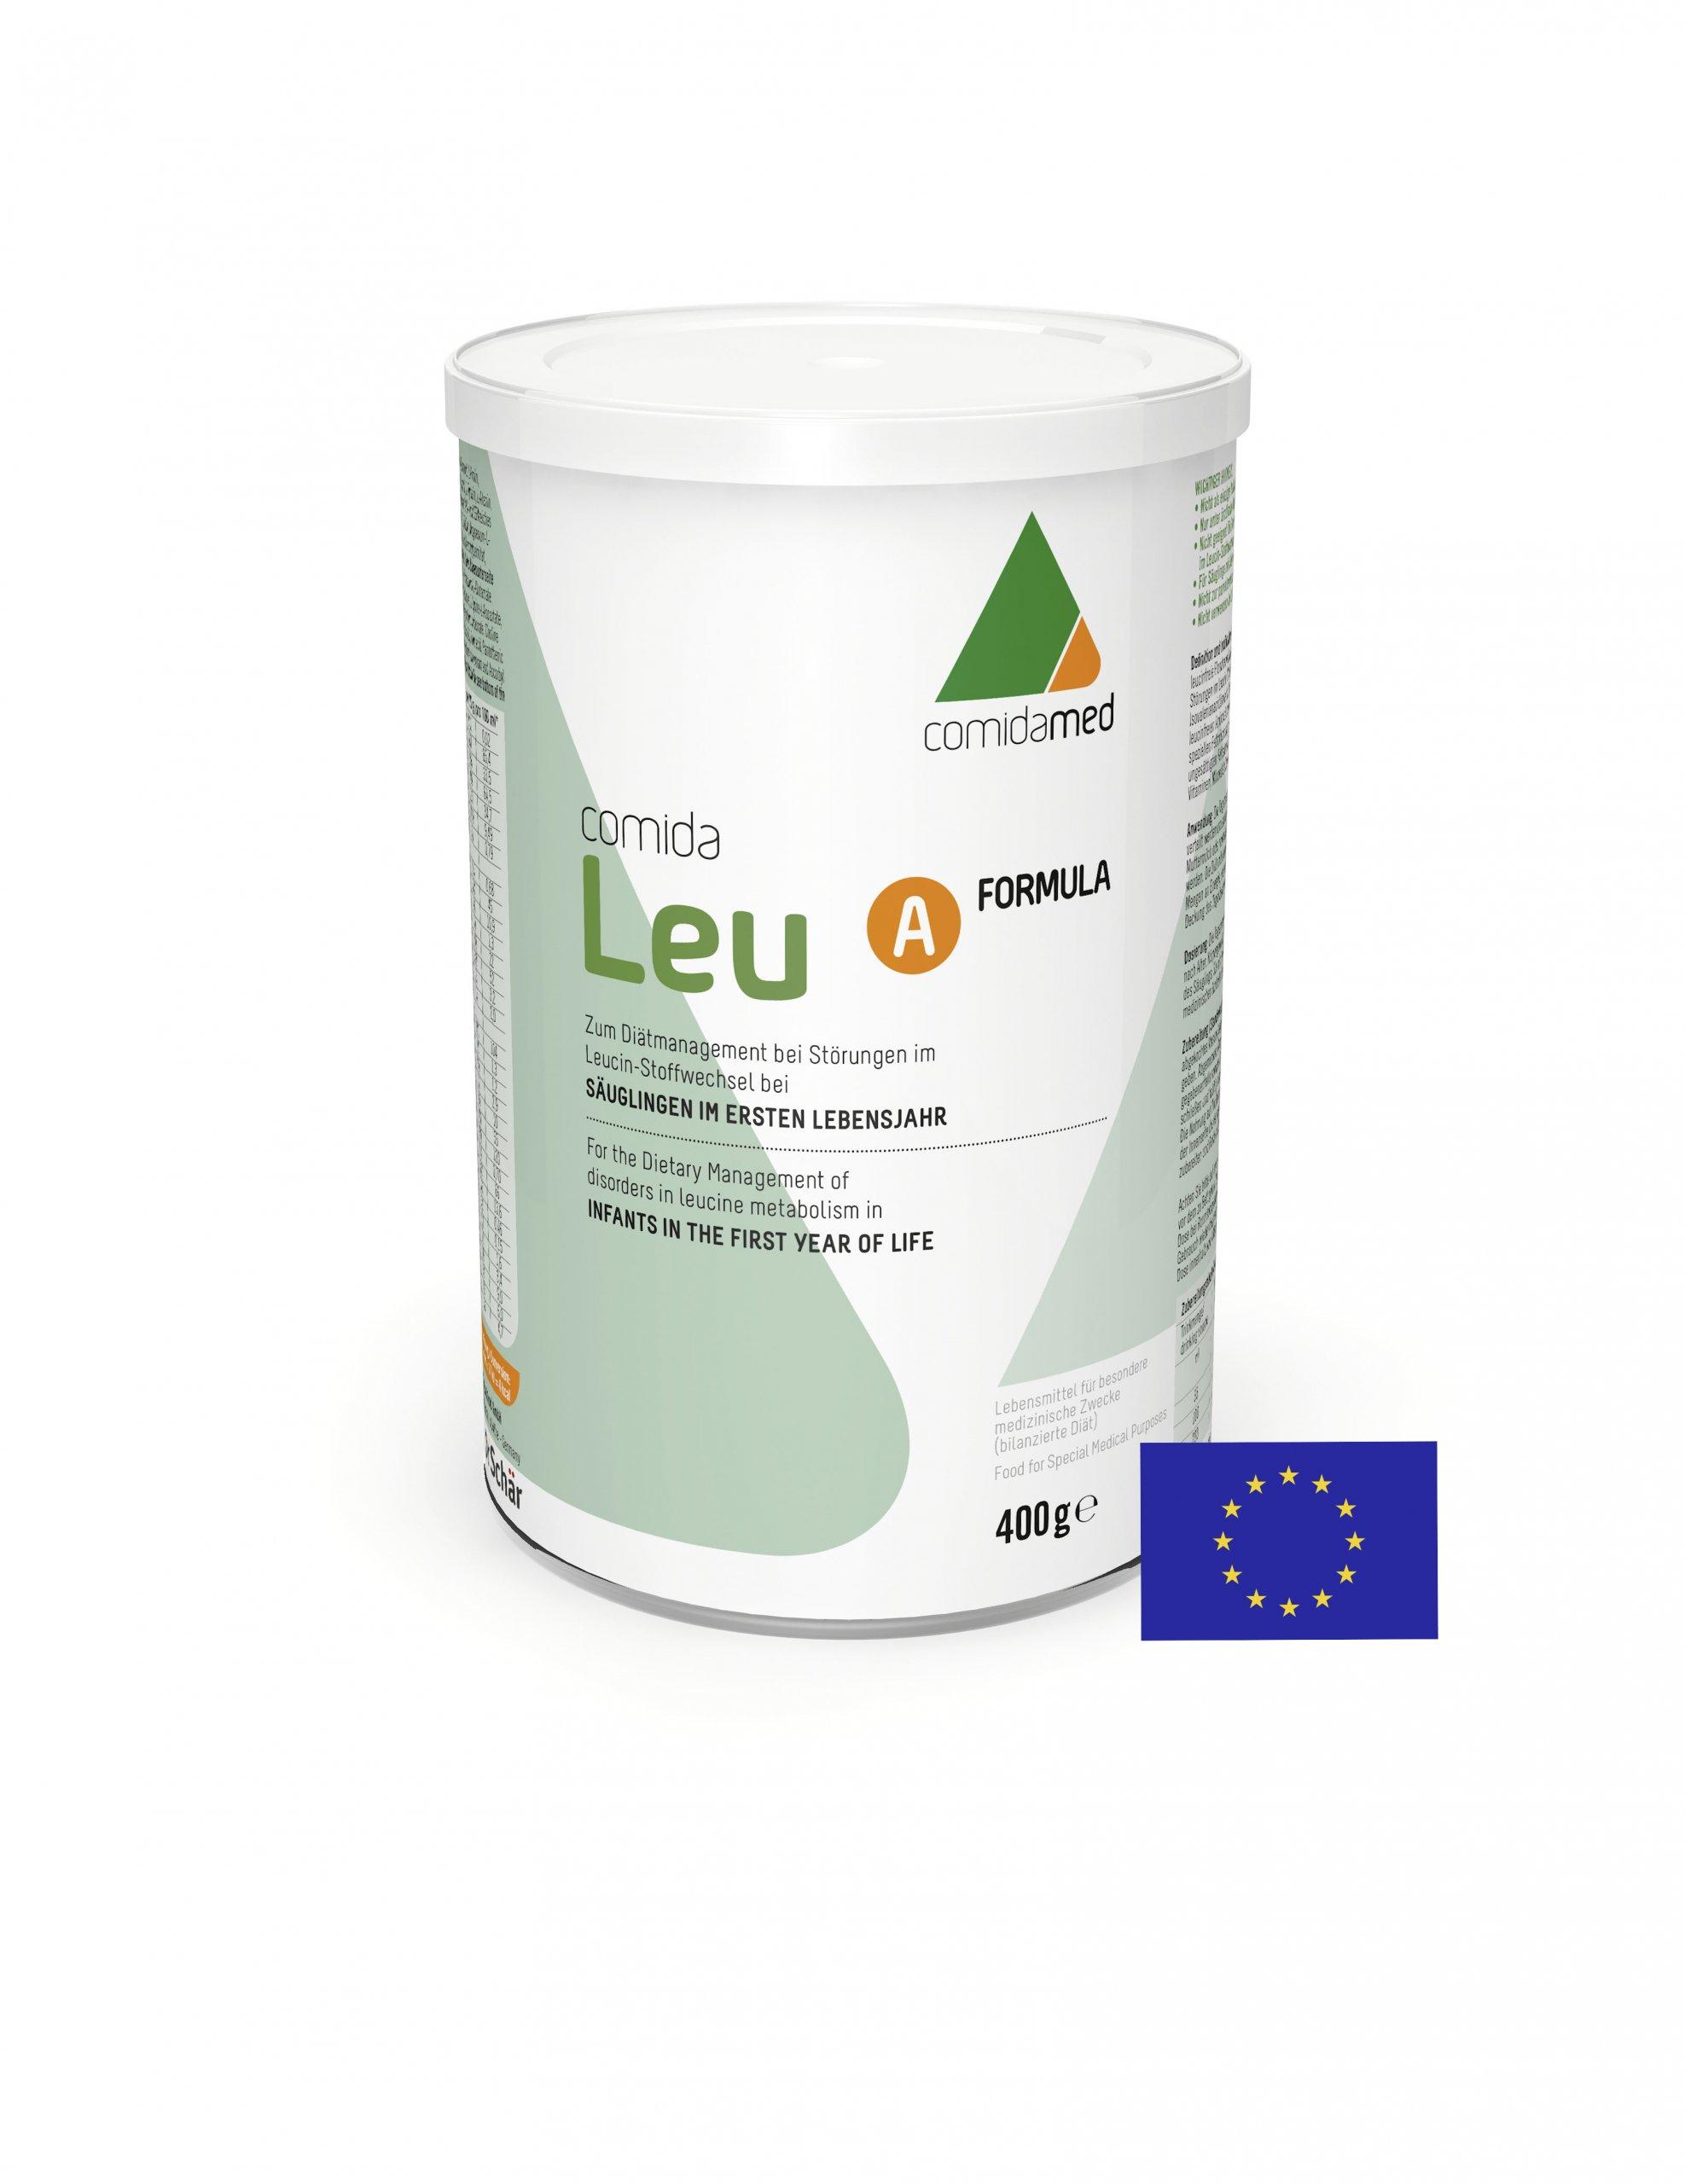 comida-Leu A FORMULA (EU)